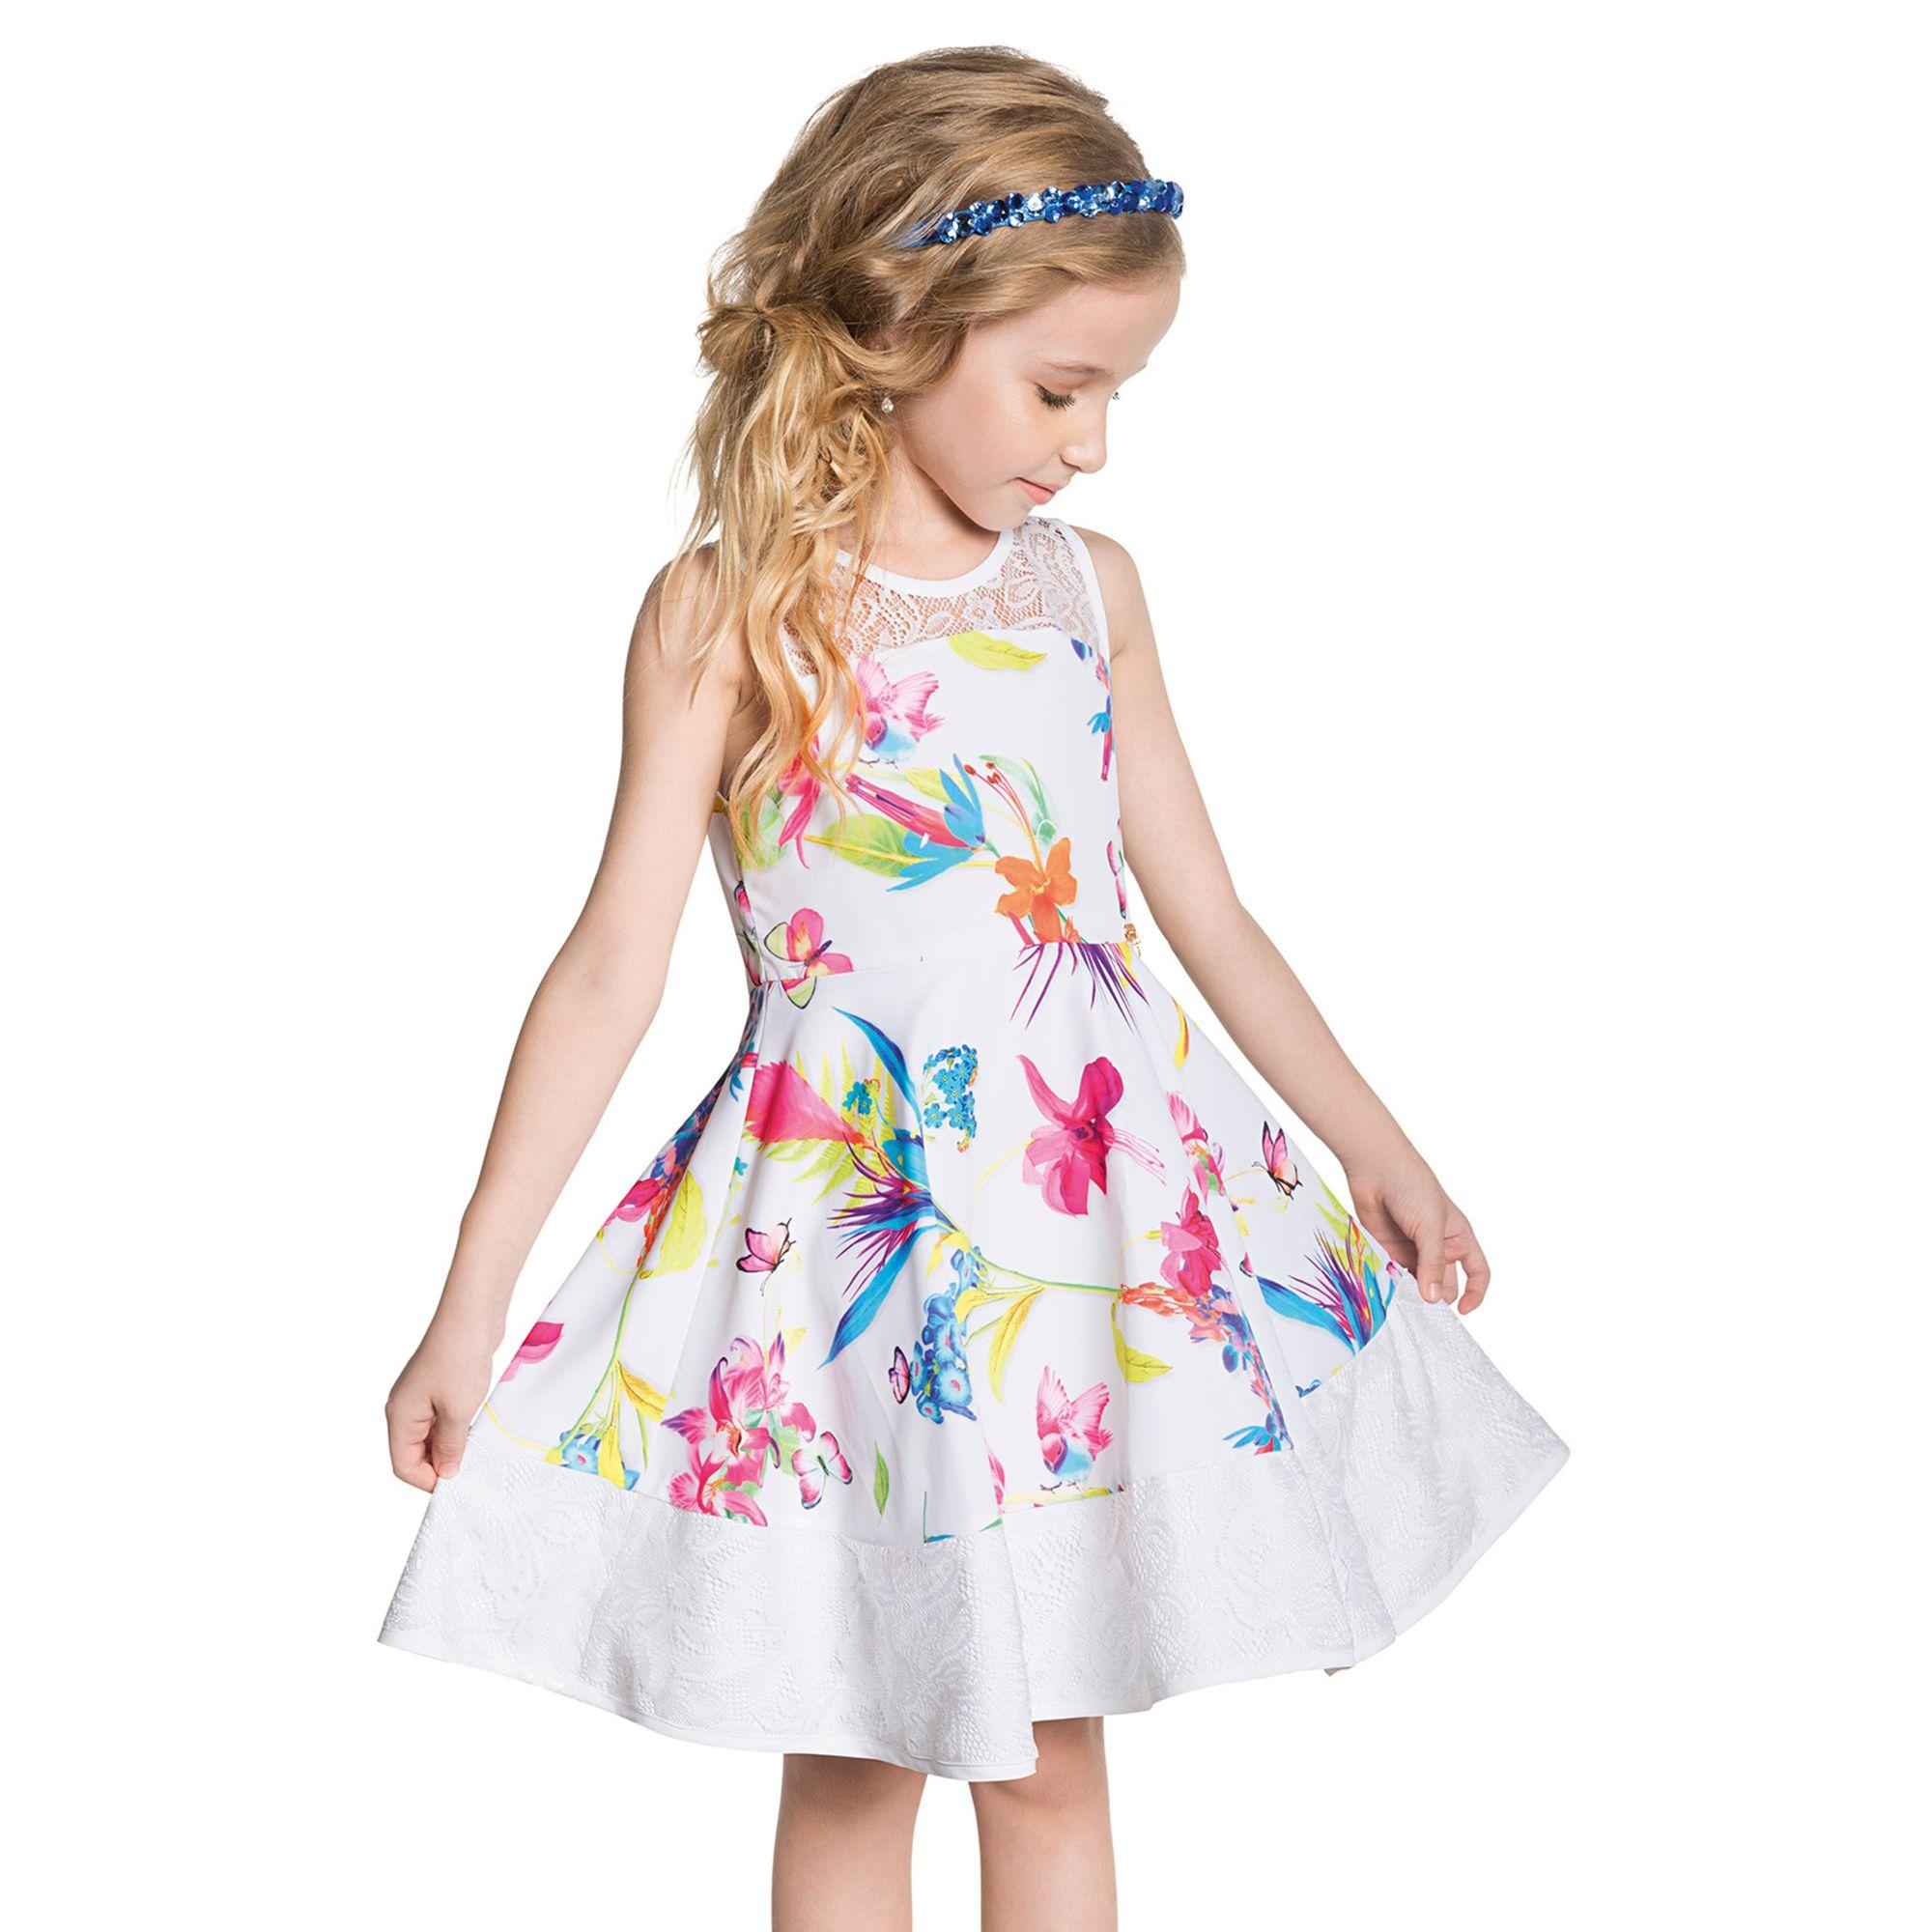 vestido-infantil-branco-flores-e-borboletas-ninali